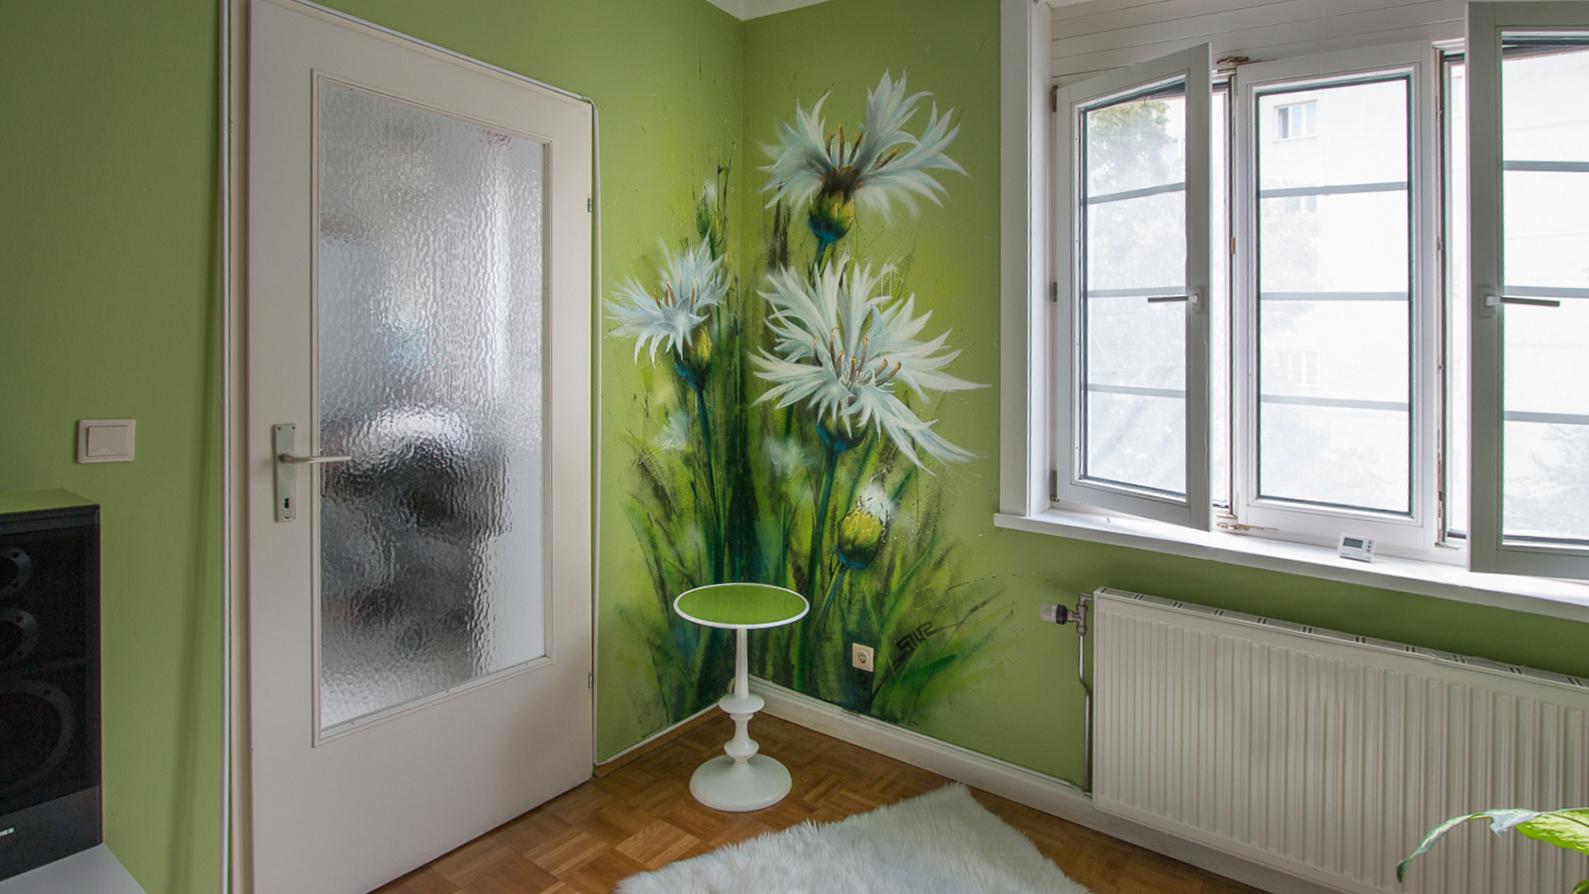 graffiti siuz. Black Bedroom Furniture Sets. Home Design Ideas